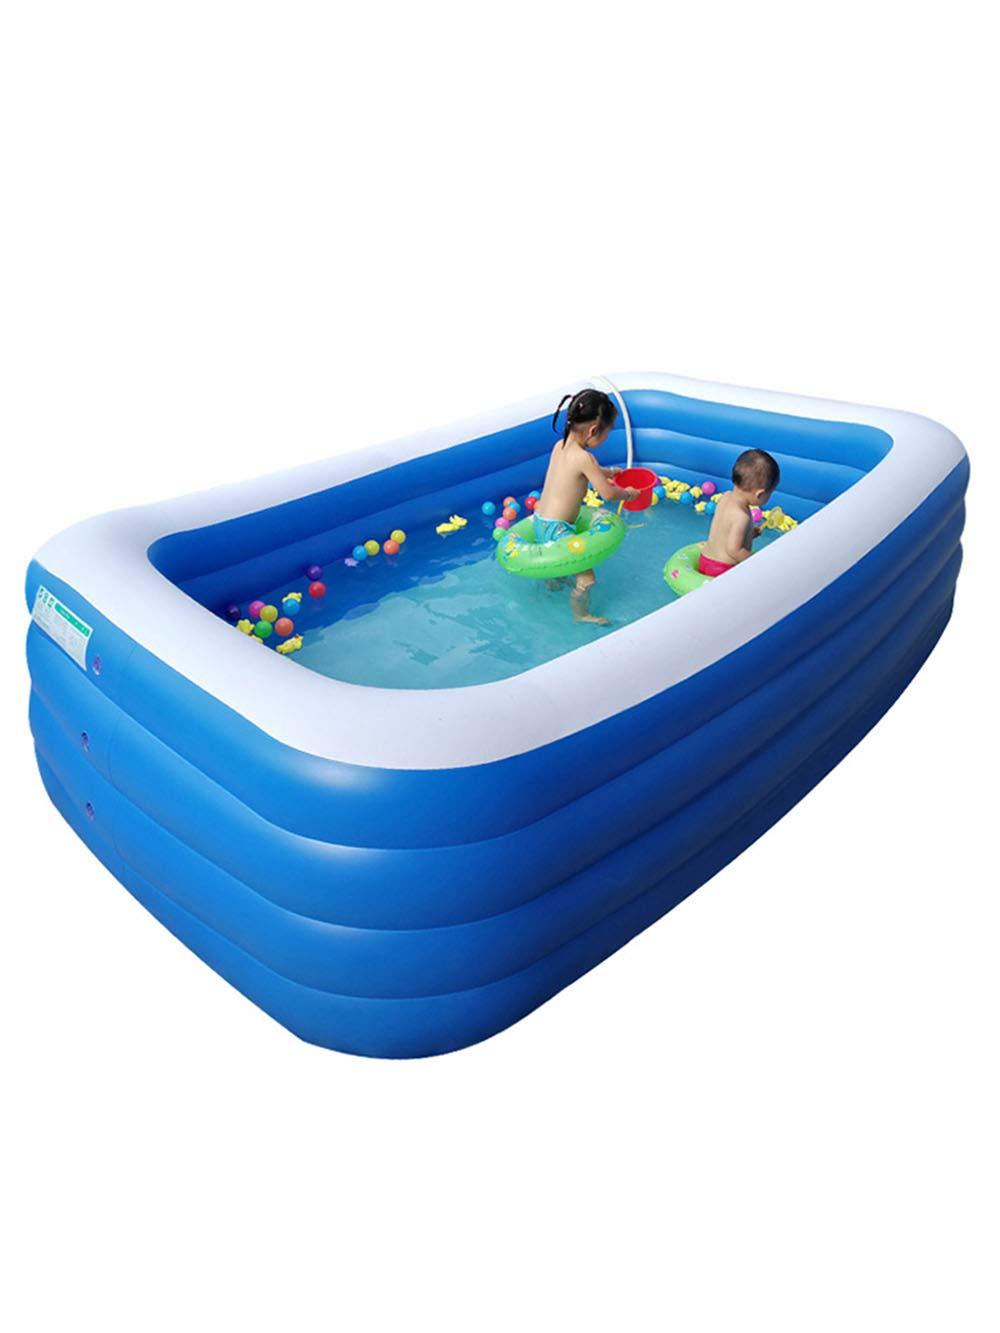 YUHAO(de) Riesiger Aufblasbarer Kinderpool - Familie Und Kinder Inflatierbarer Rechteckiger Pool(180x140x68cm)  150x105x50cm